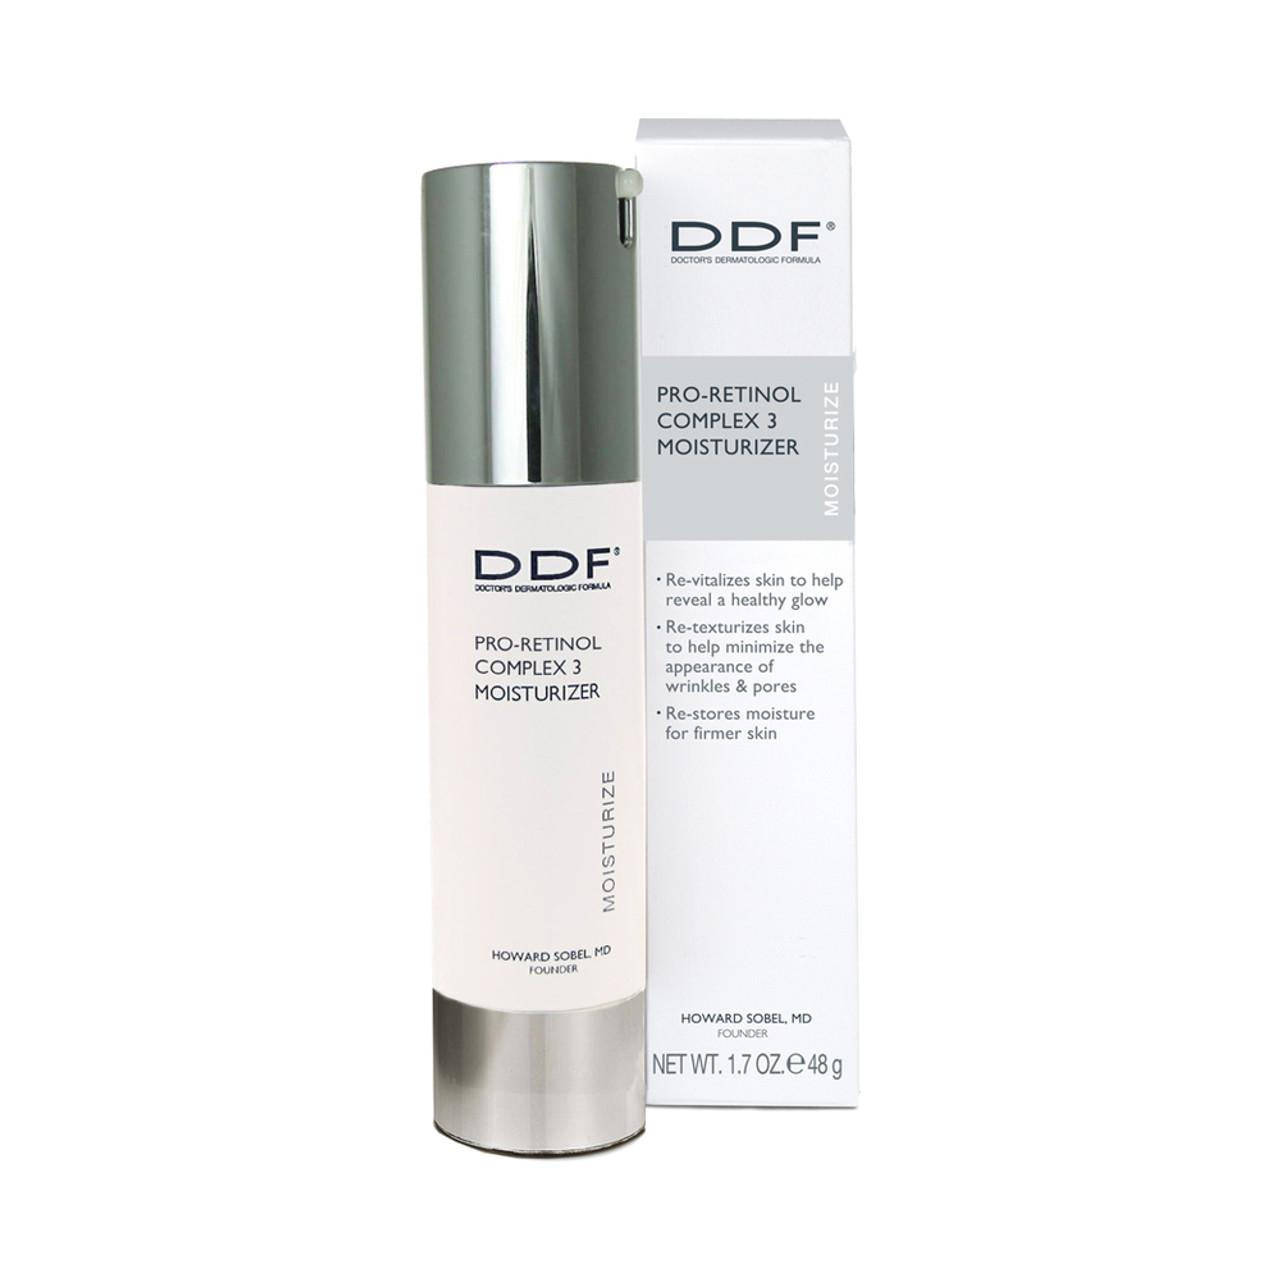 DDF Pro-Retinol Complex 3 Moisturizer BeautifiedYou.com